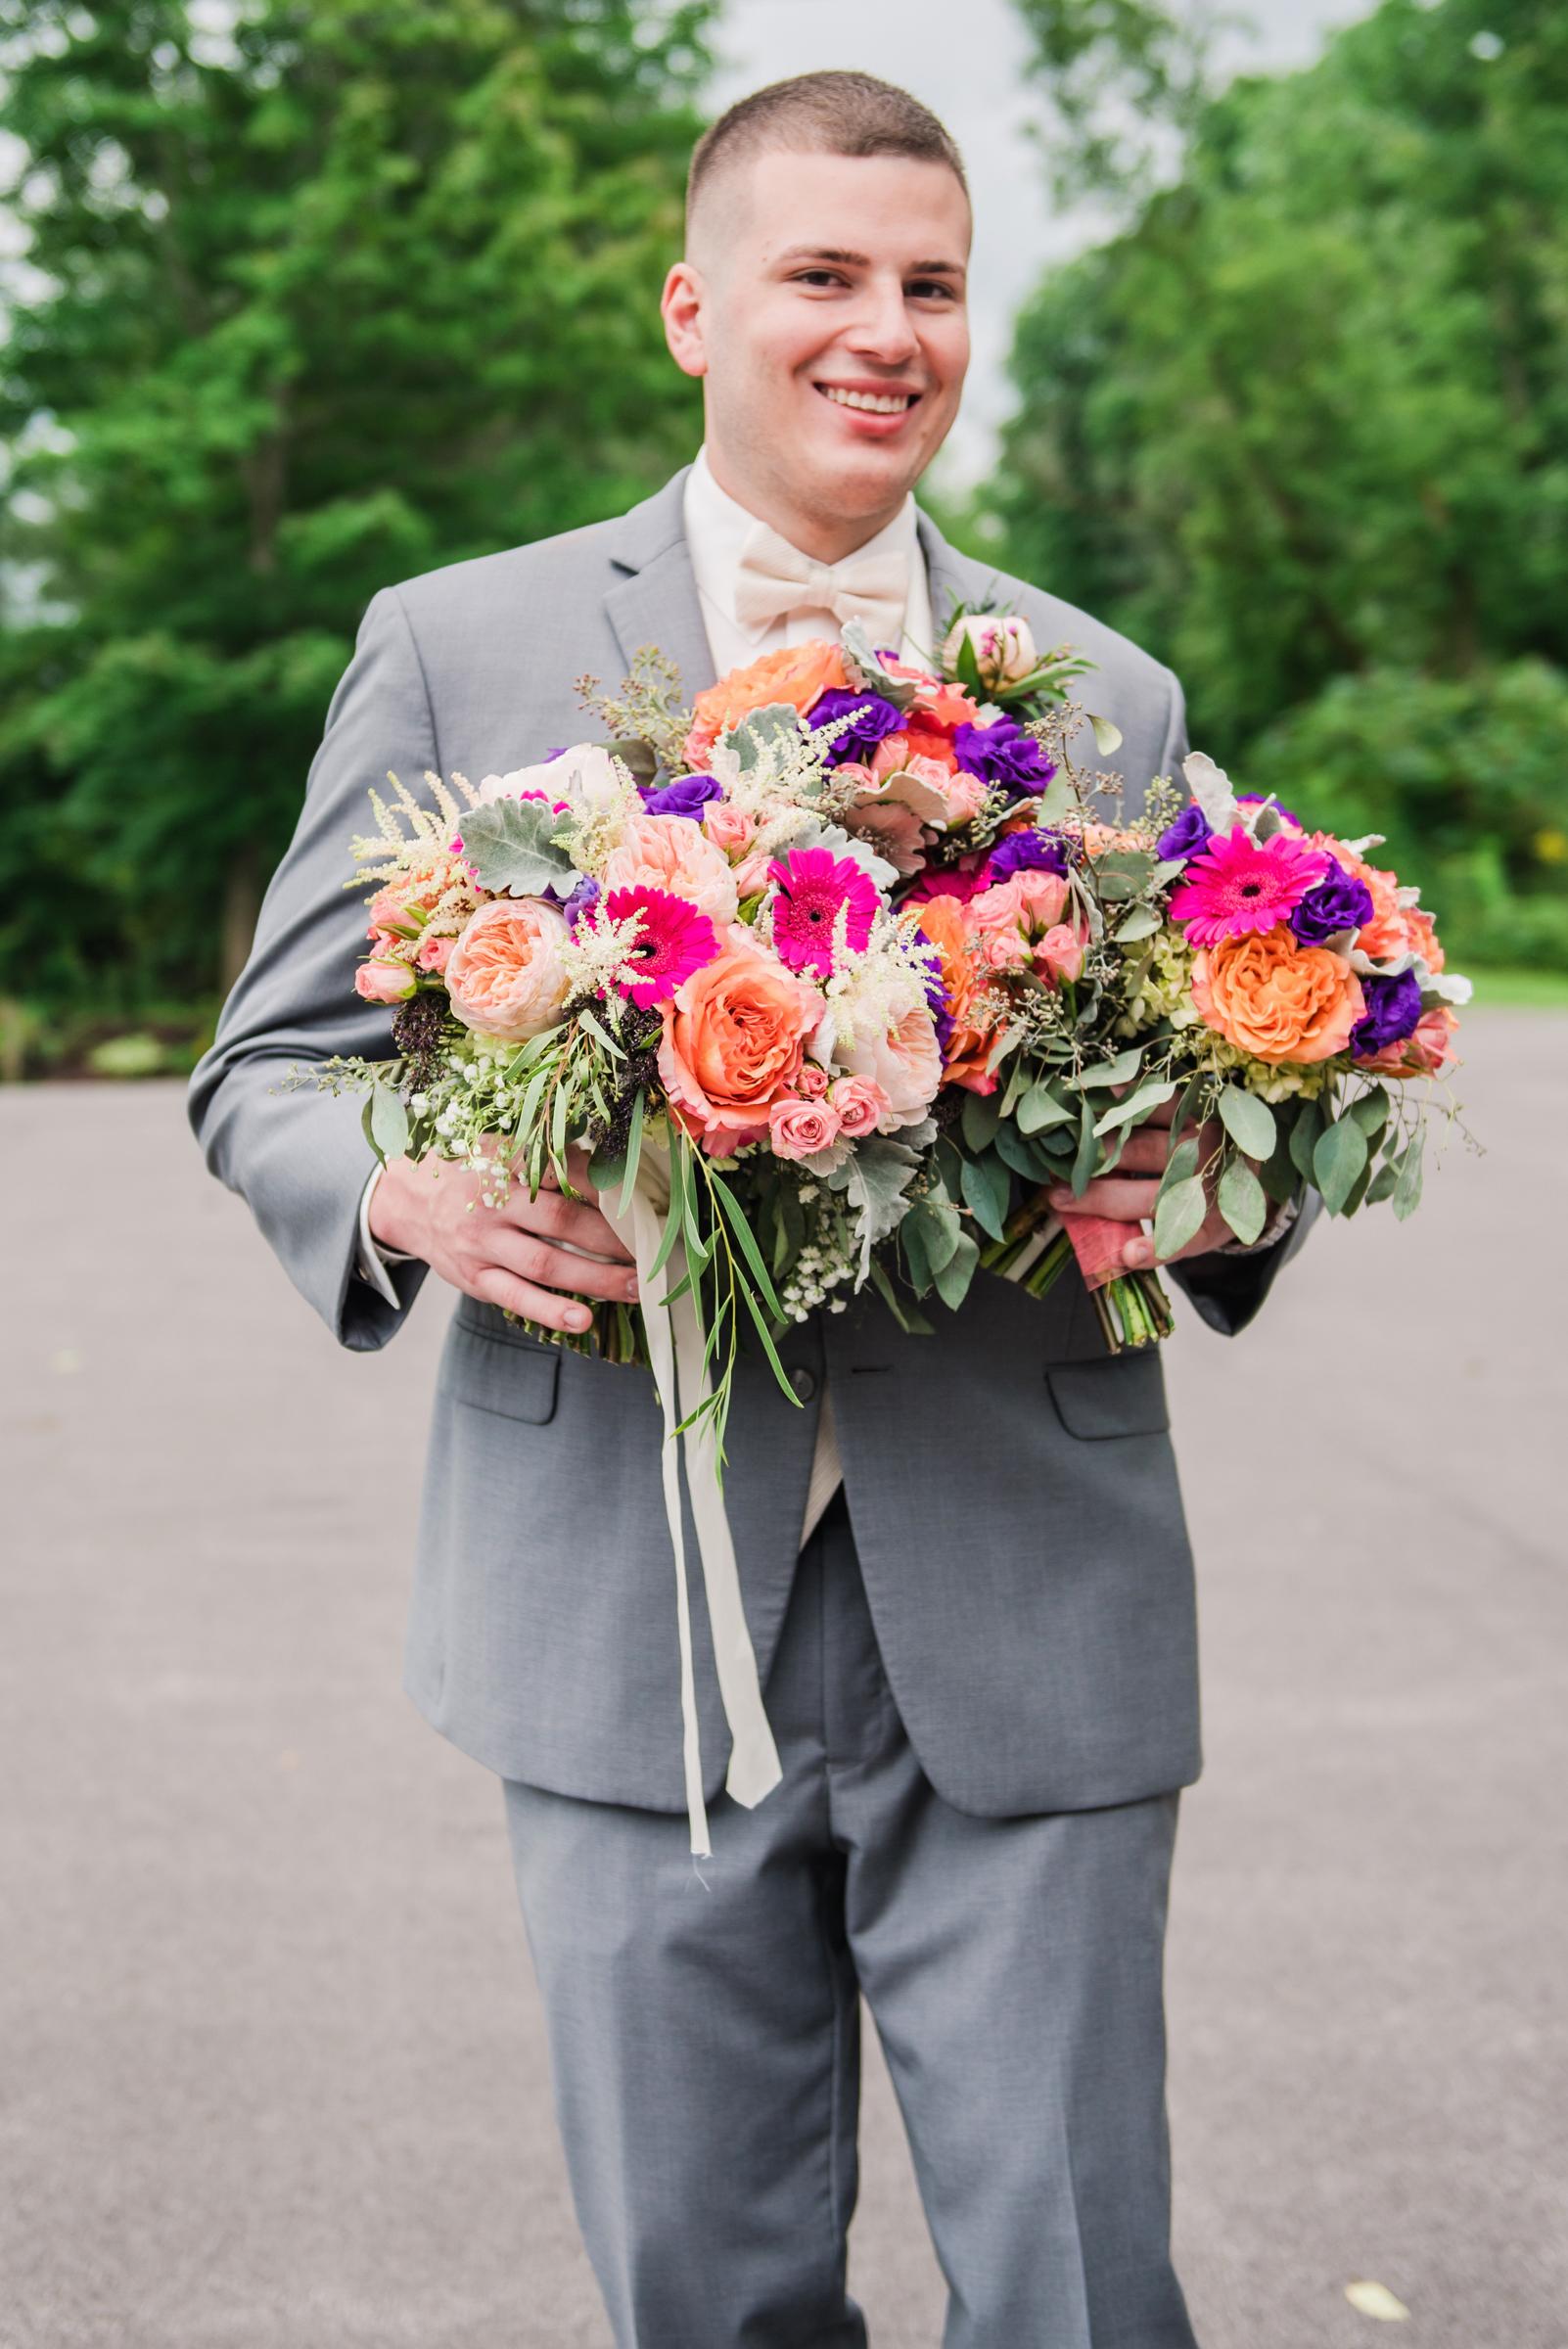 Wolf_Oak_Acres_Central_NY_Wedding_JILL_STUDIO_Rochester_NY_Photographer_DSC_8646.jpg